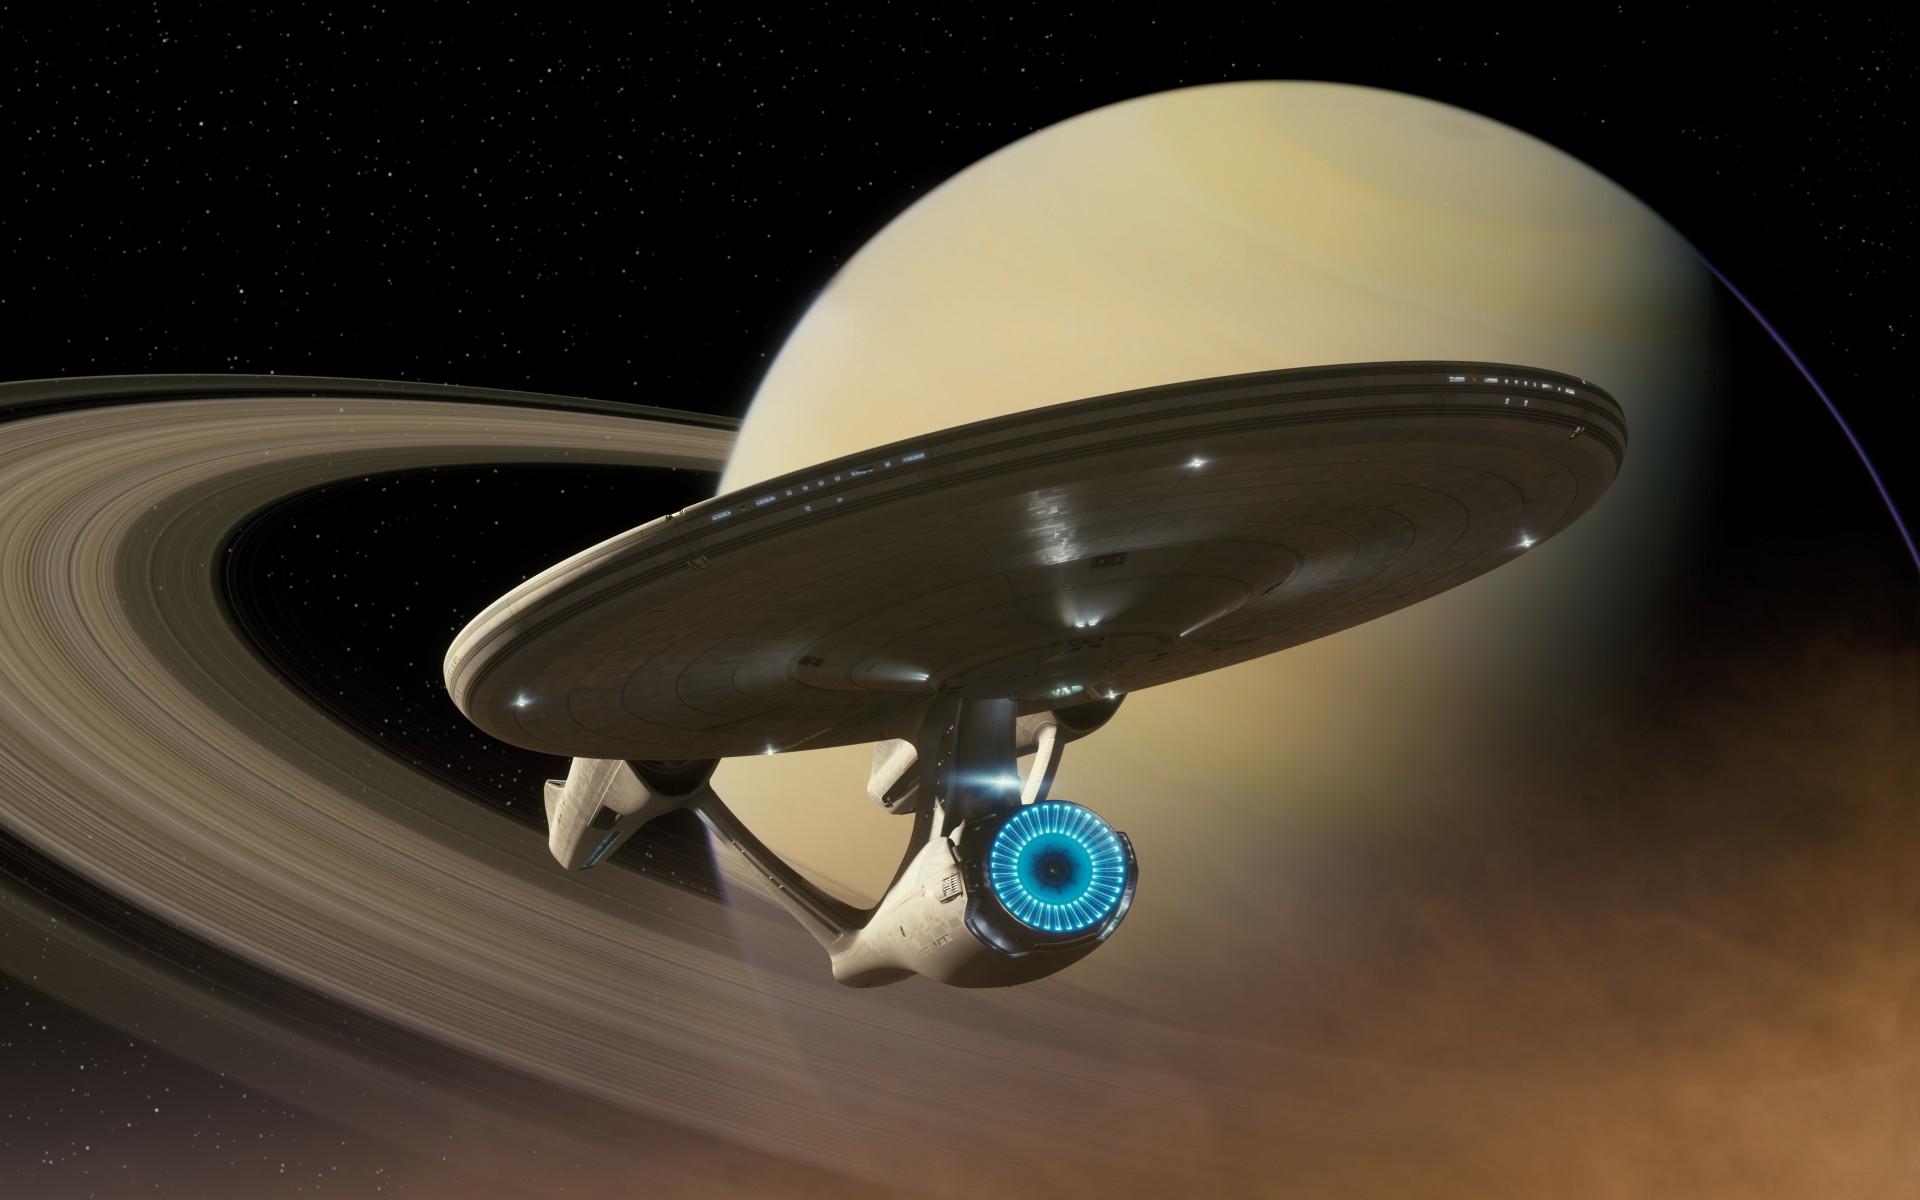 tv spacecraft - photo #19